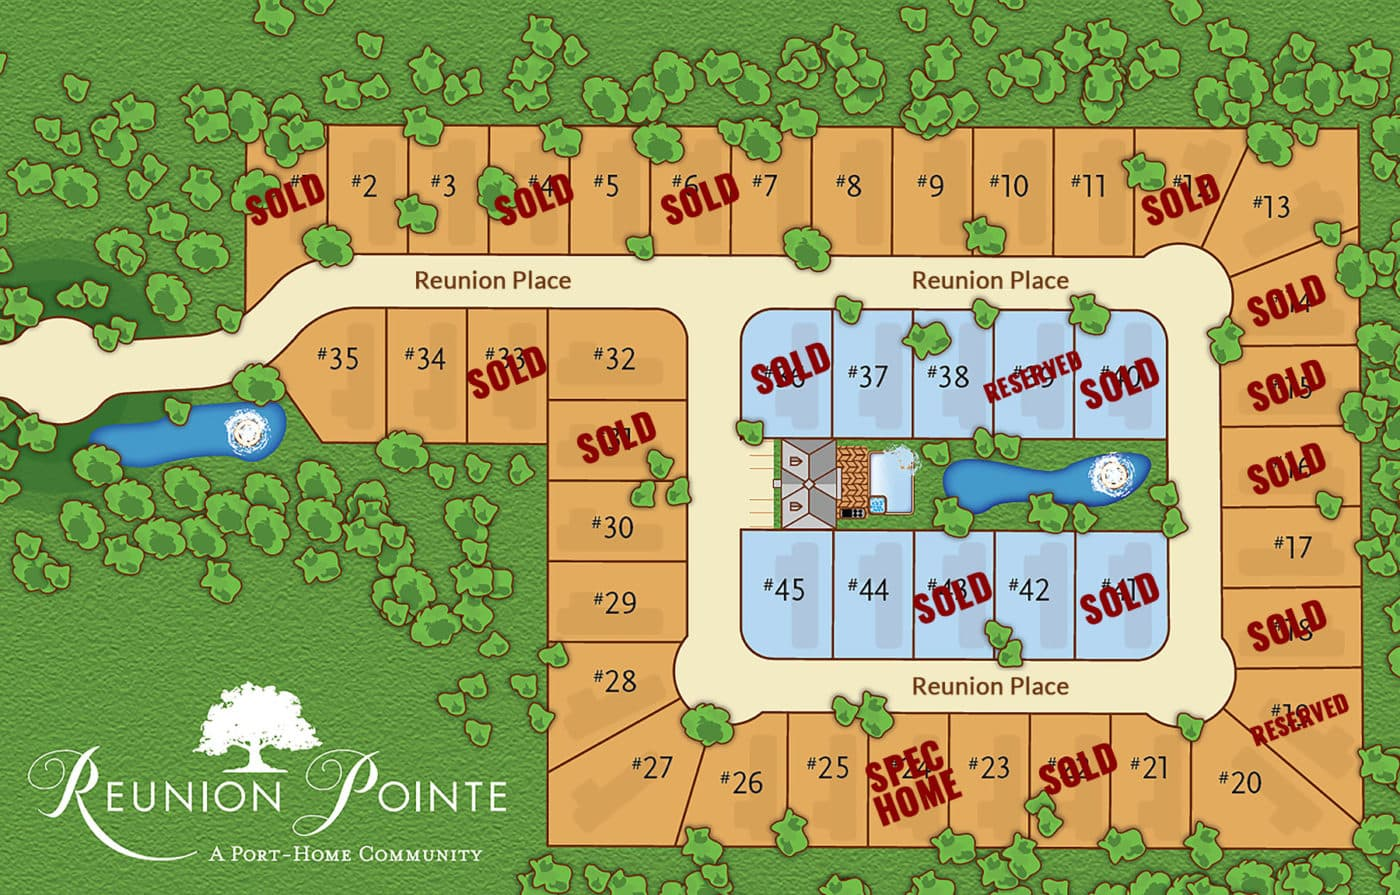 Reunion Pointe RV Port-Home Community lot plan